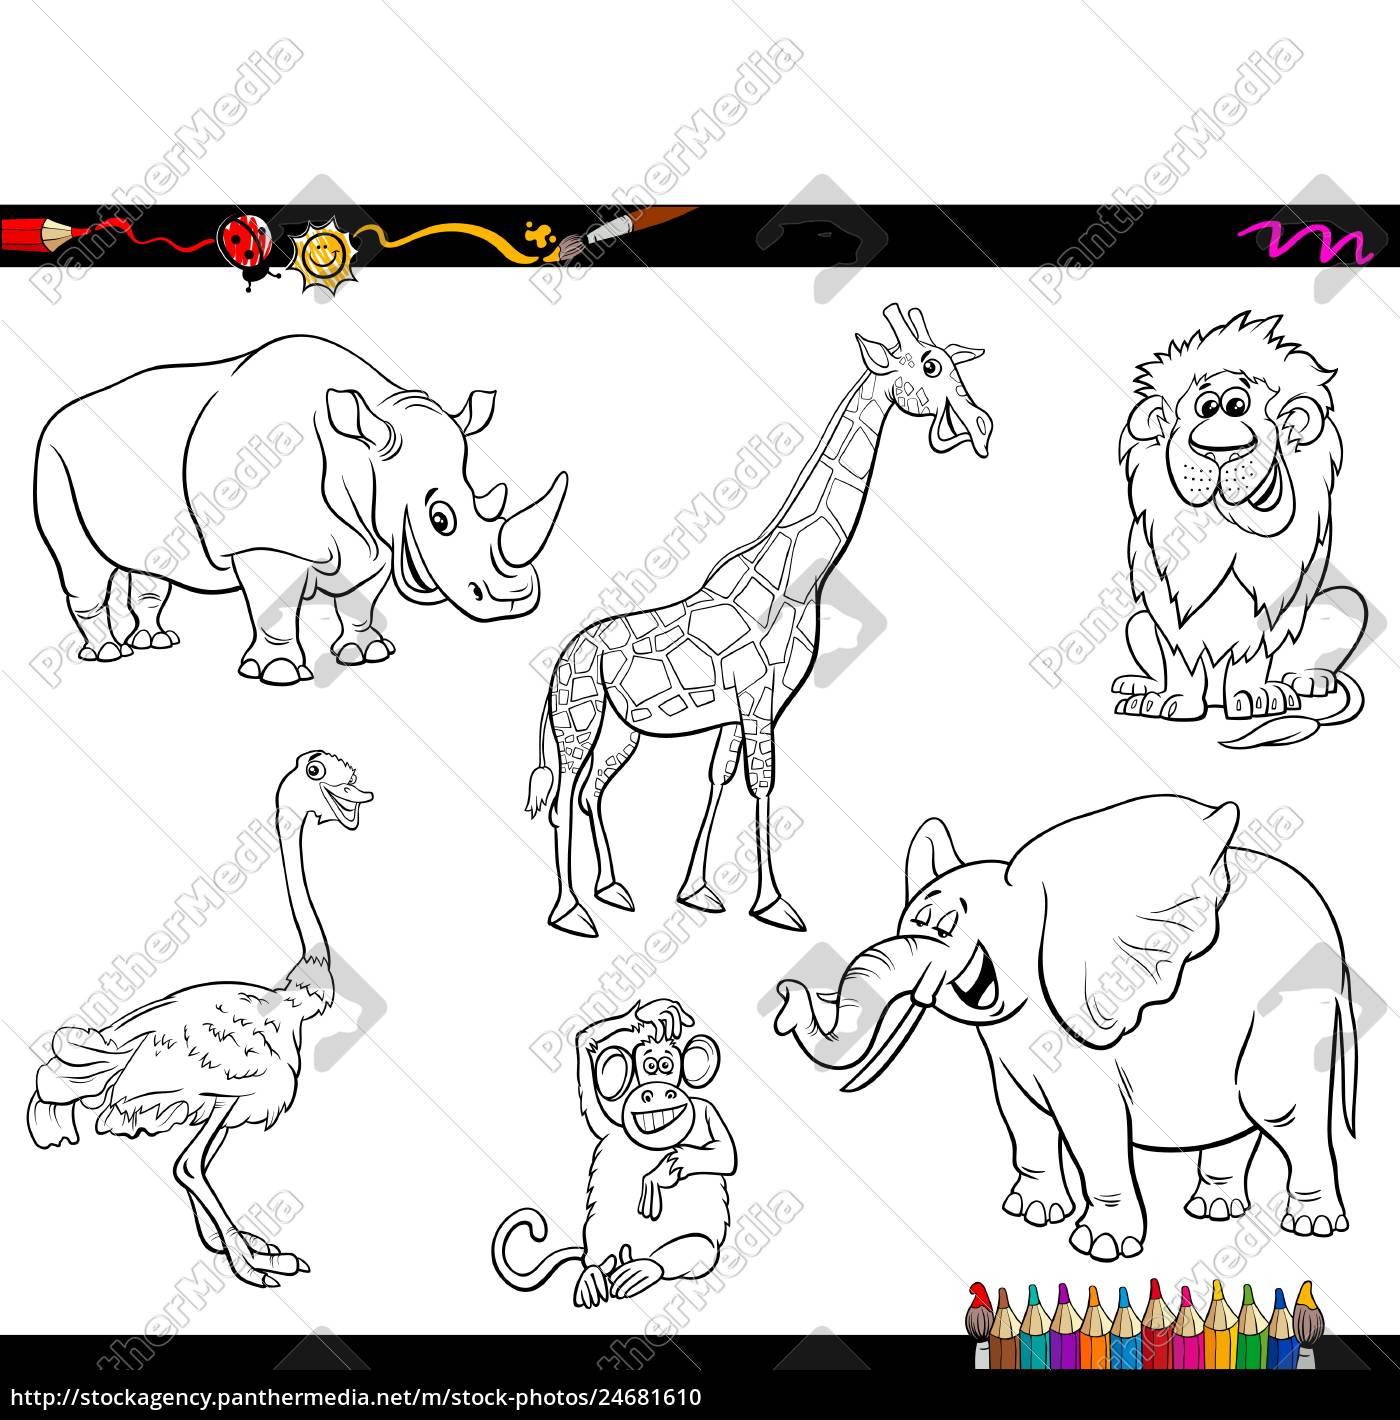 safari cartoon animal characters coloring book - Stock image ...